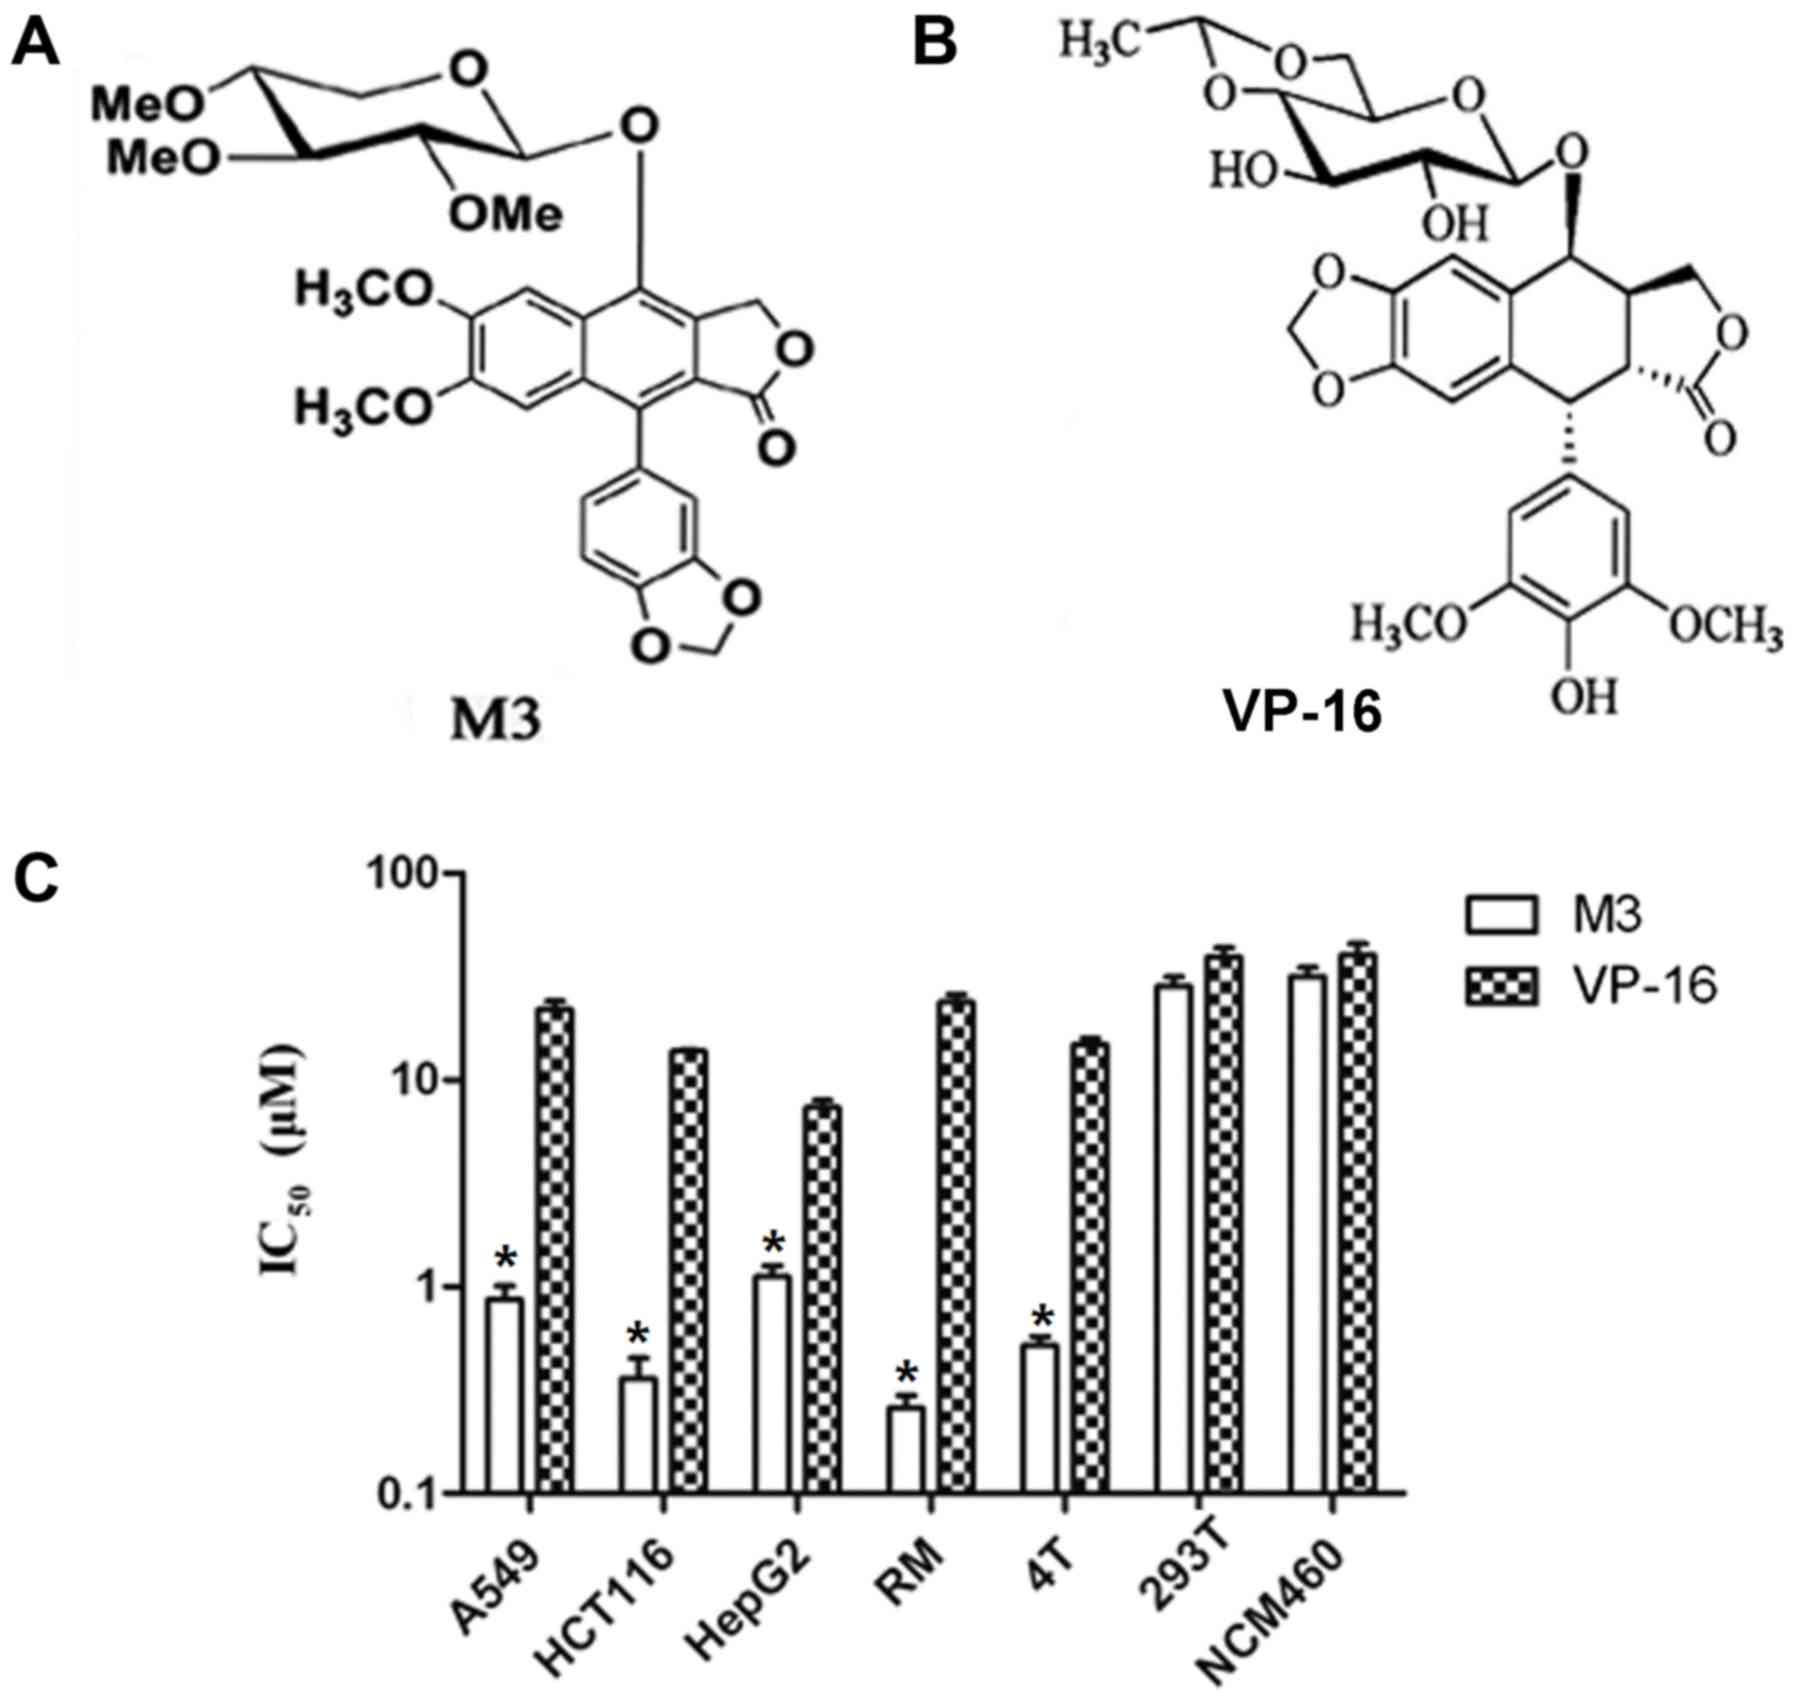 M3, a natural lignan xyloside, exhibits potent anticancer activity